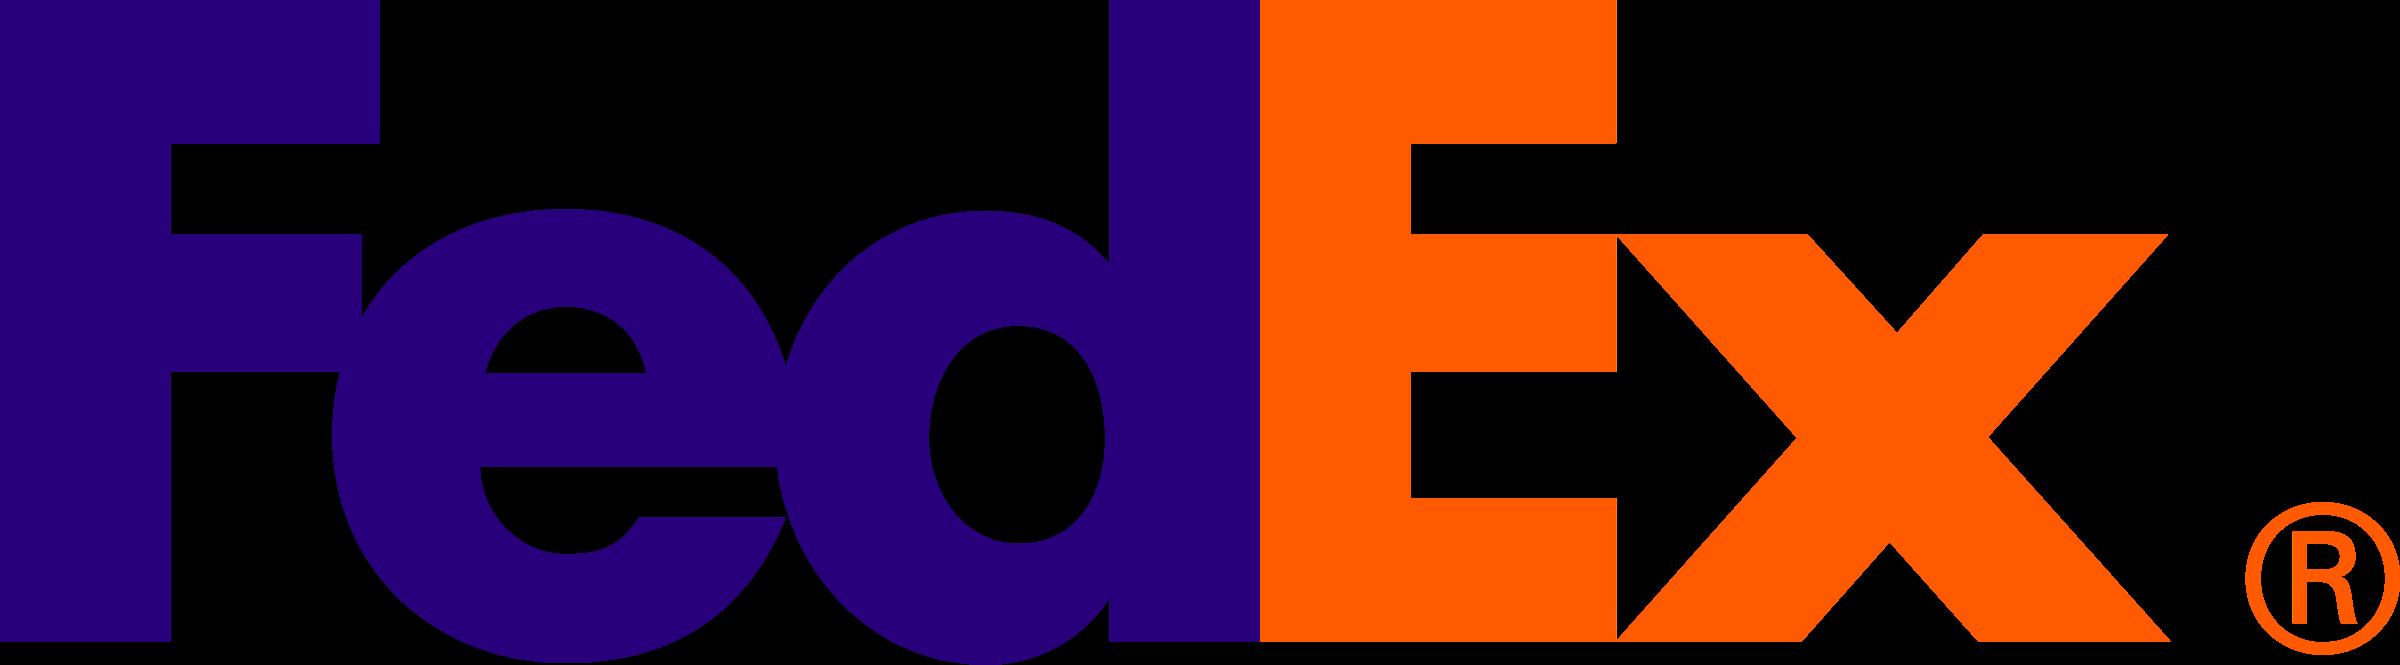 Fedex Express Logo Png Transparent Svg Vector Freebie.